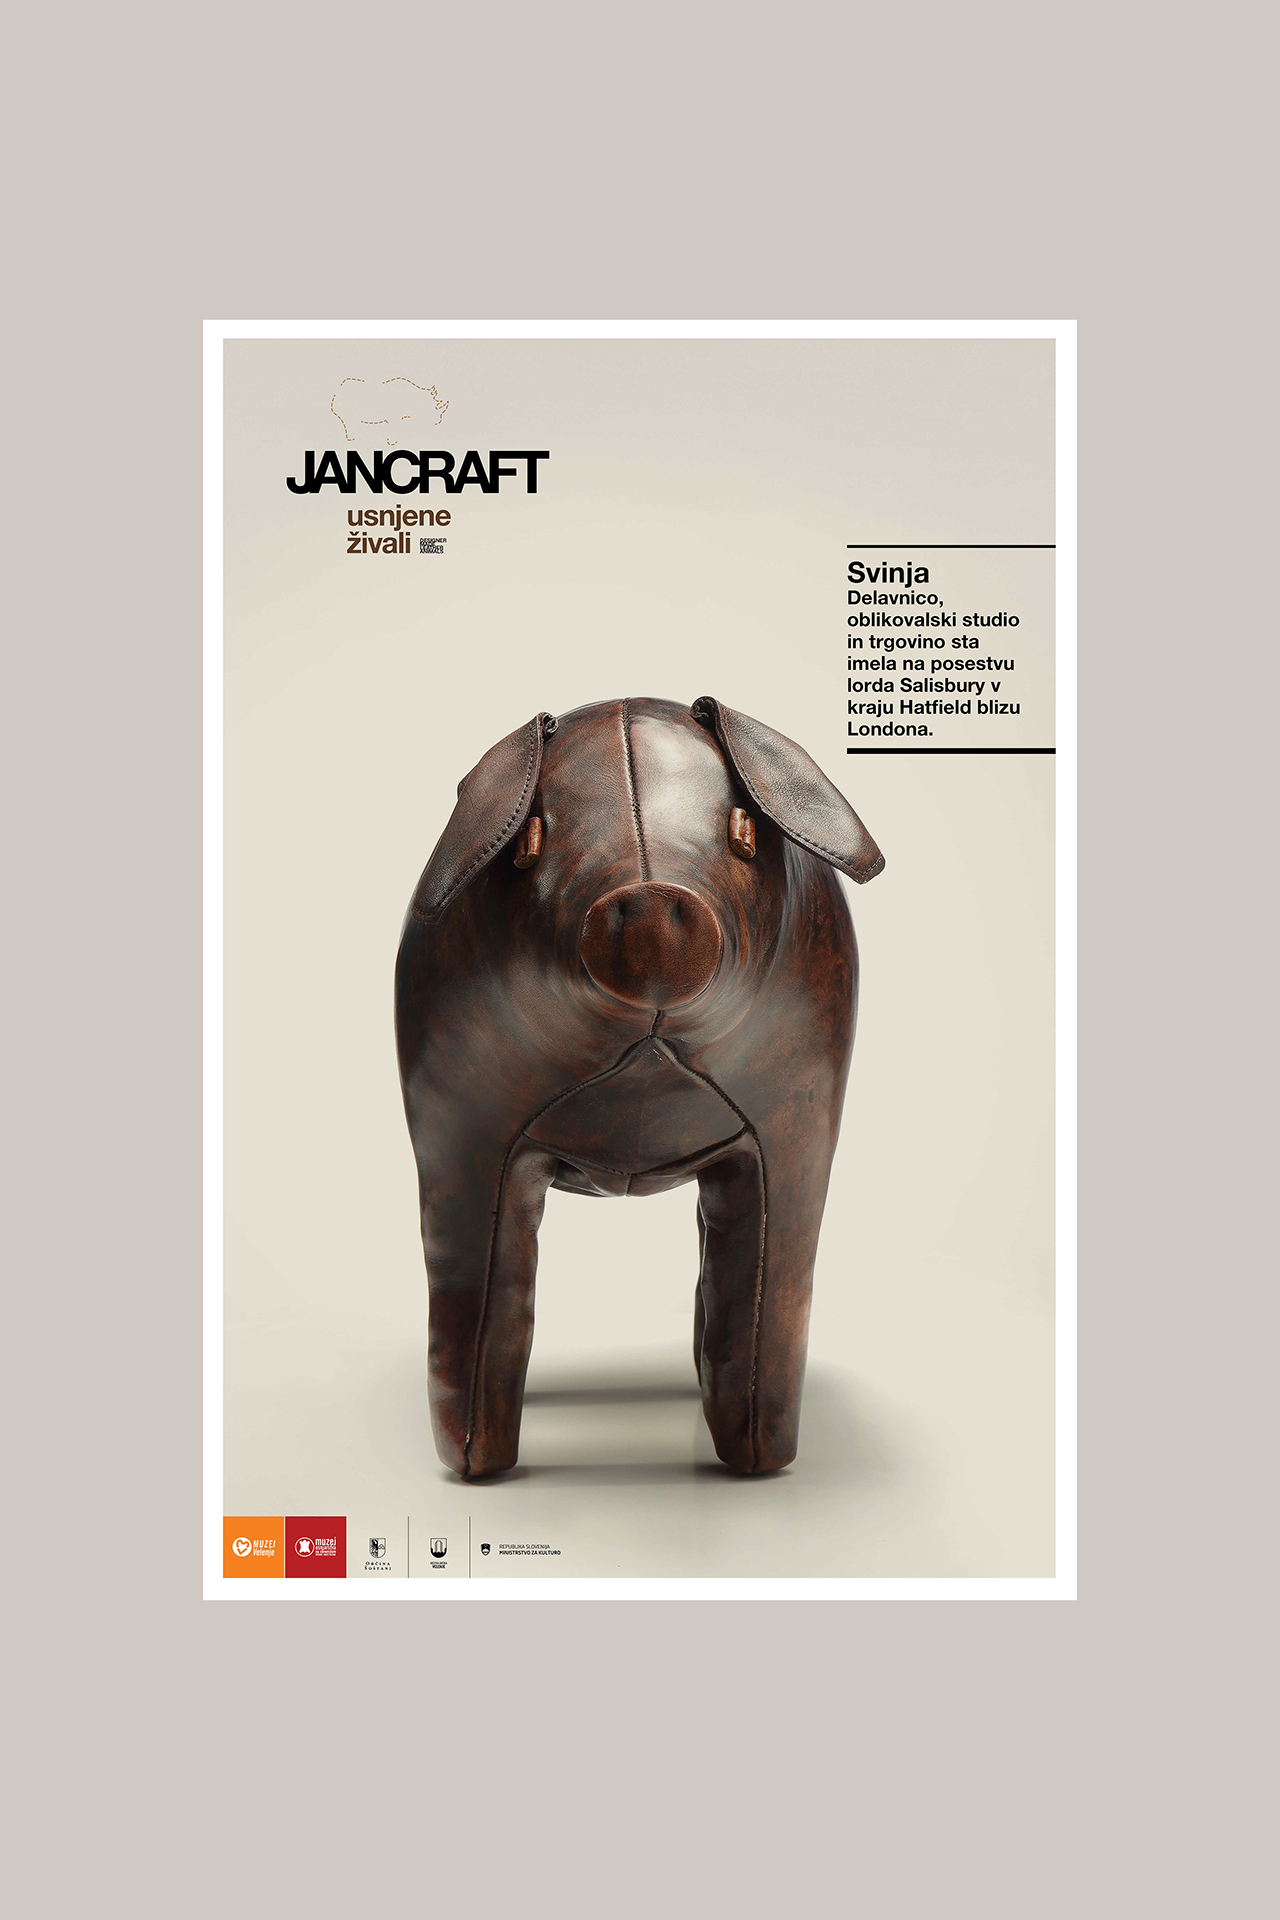 jancraft_plakati_razstava_856x1250_screen-5